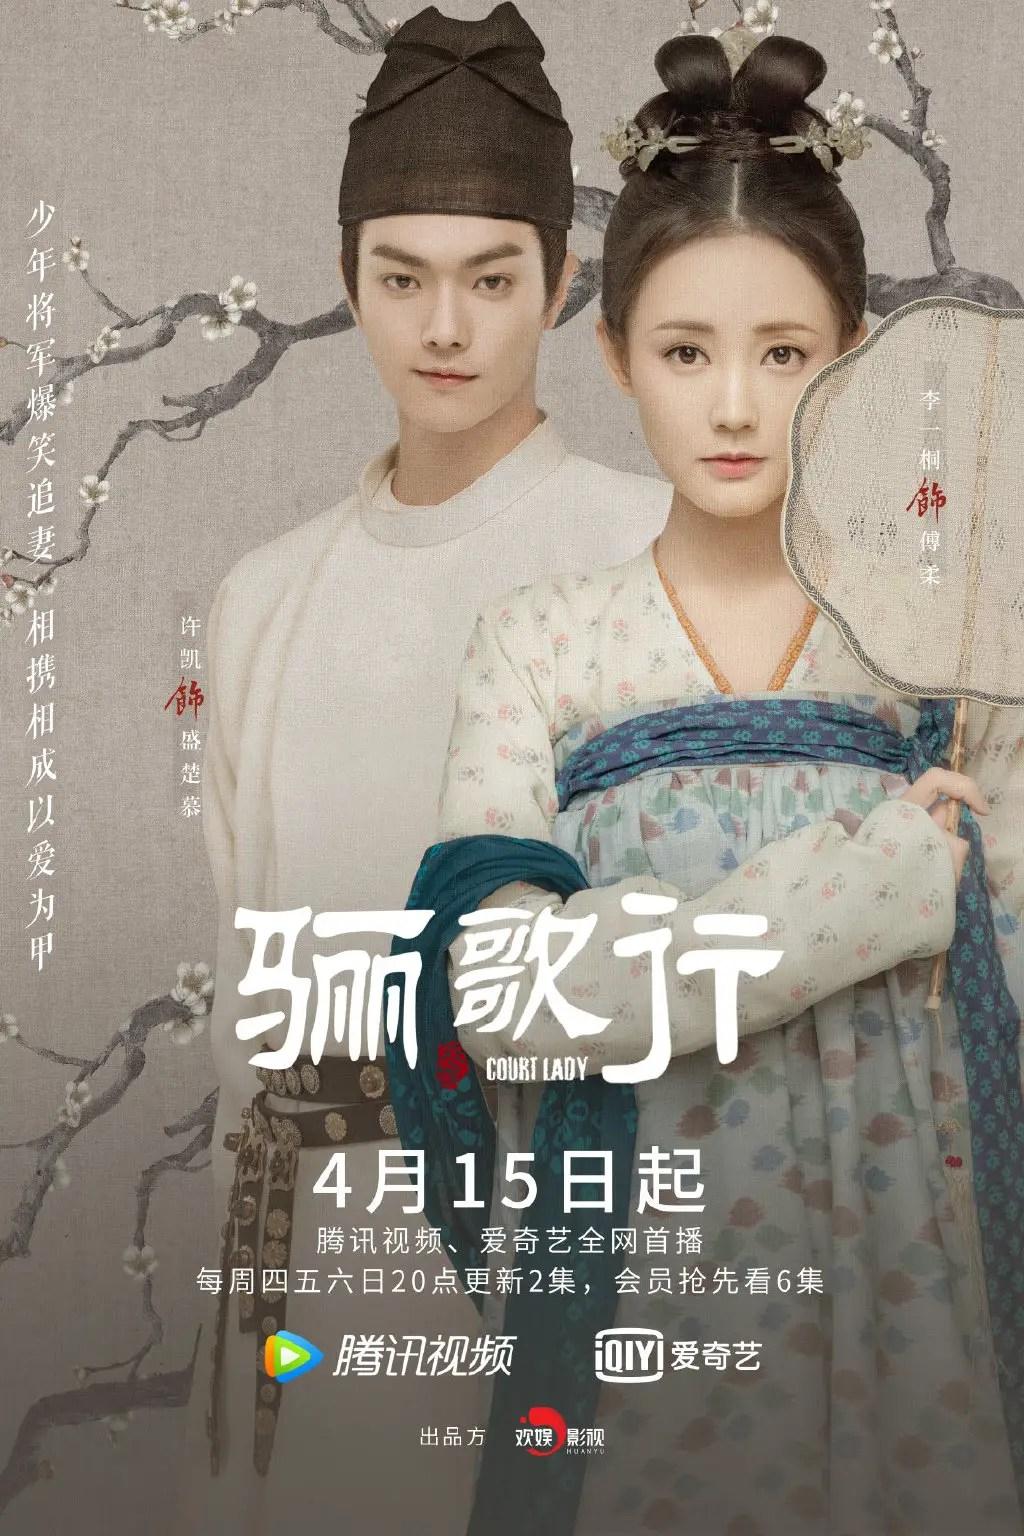 Court Lady Chinese Drama Poster